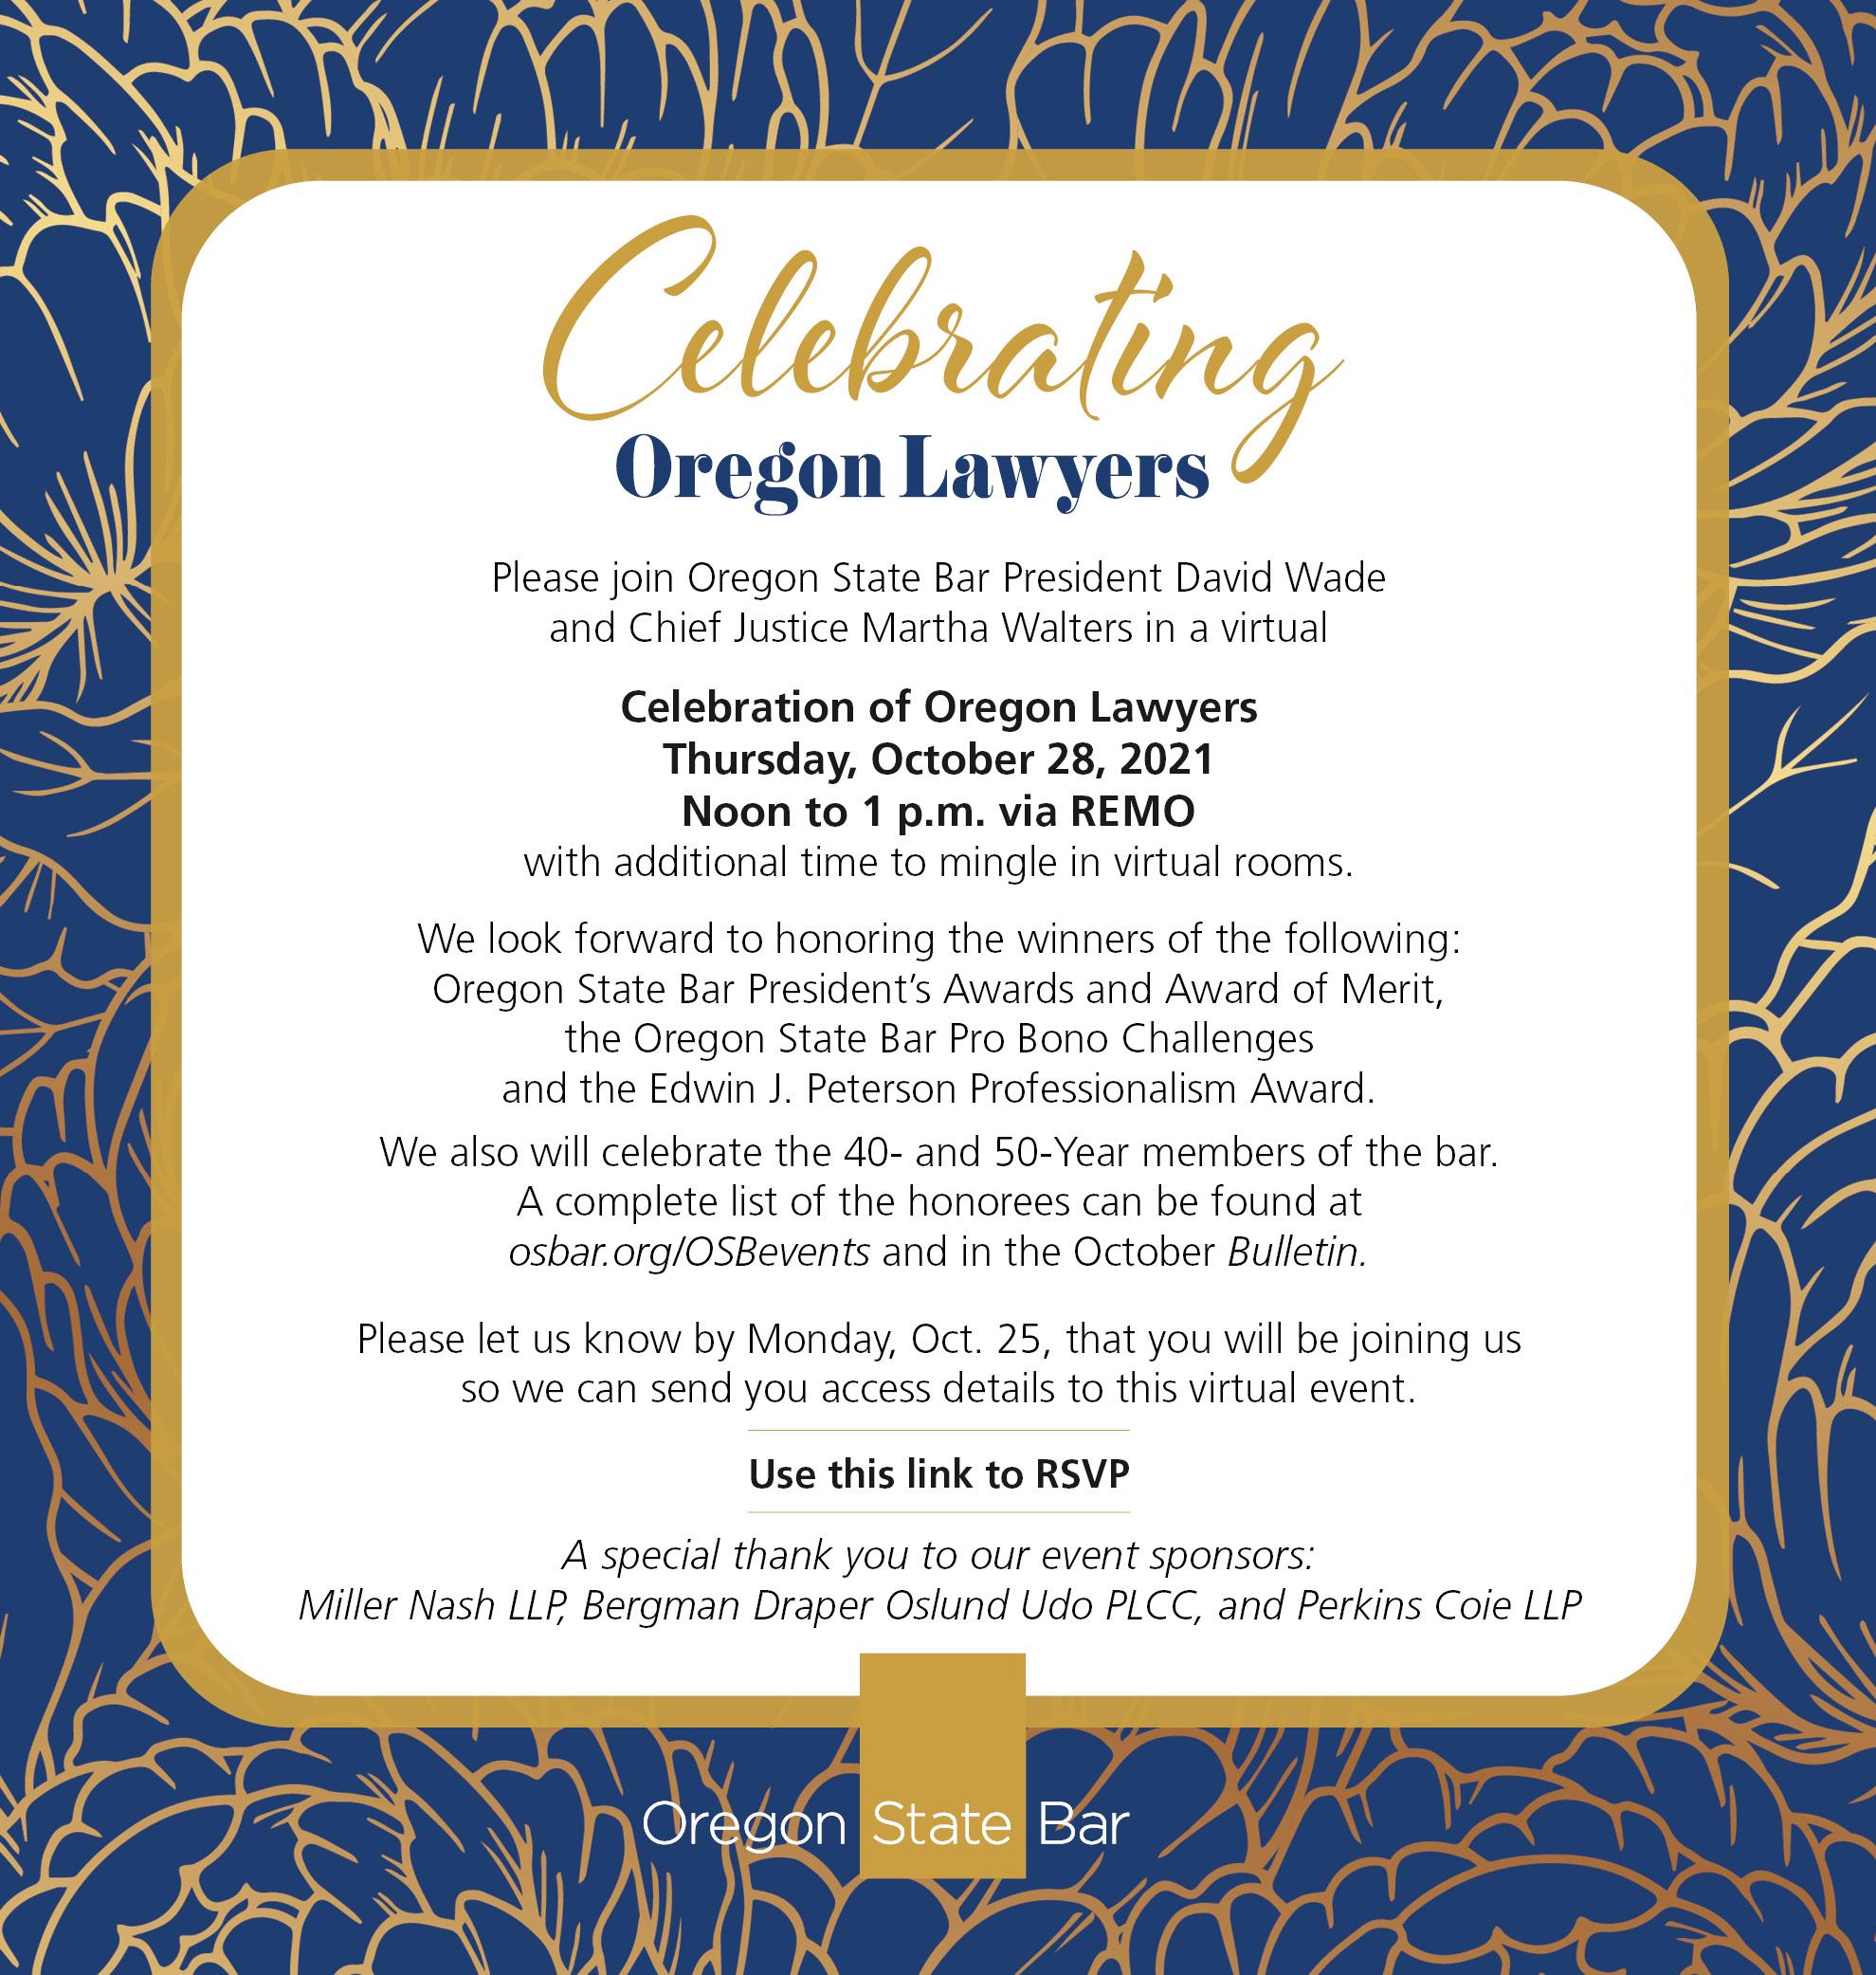 Celebrate Oregon Lawyers